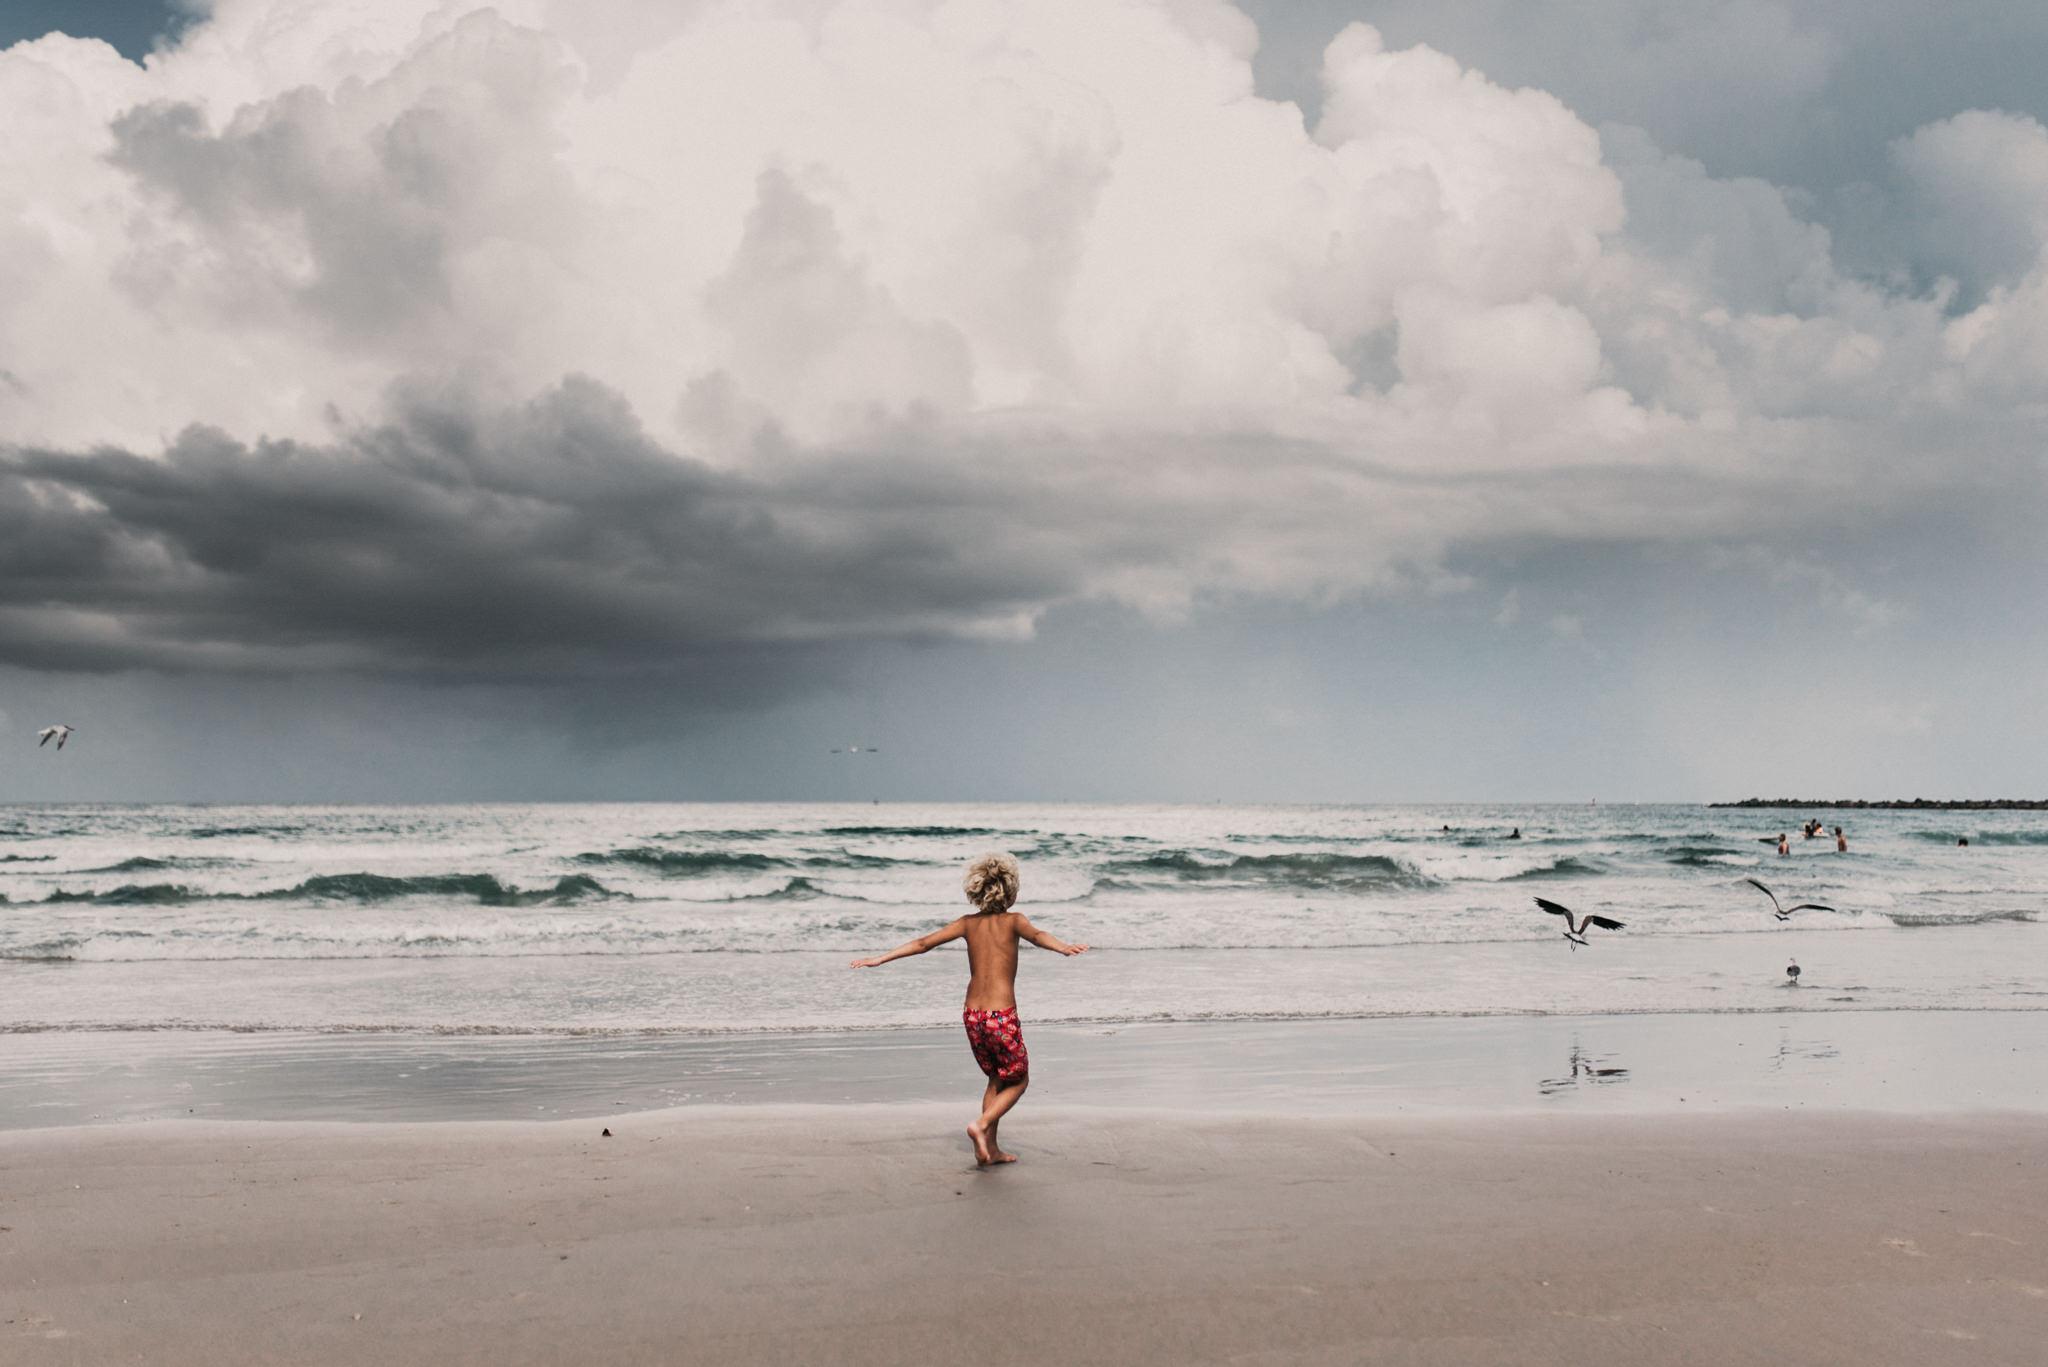 twyla jones photography - treasure coast florida - stormy beach boy playing in sand--3.jpg